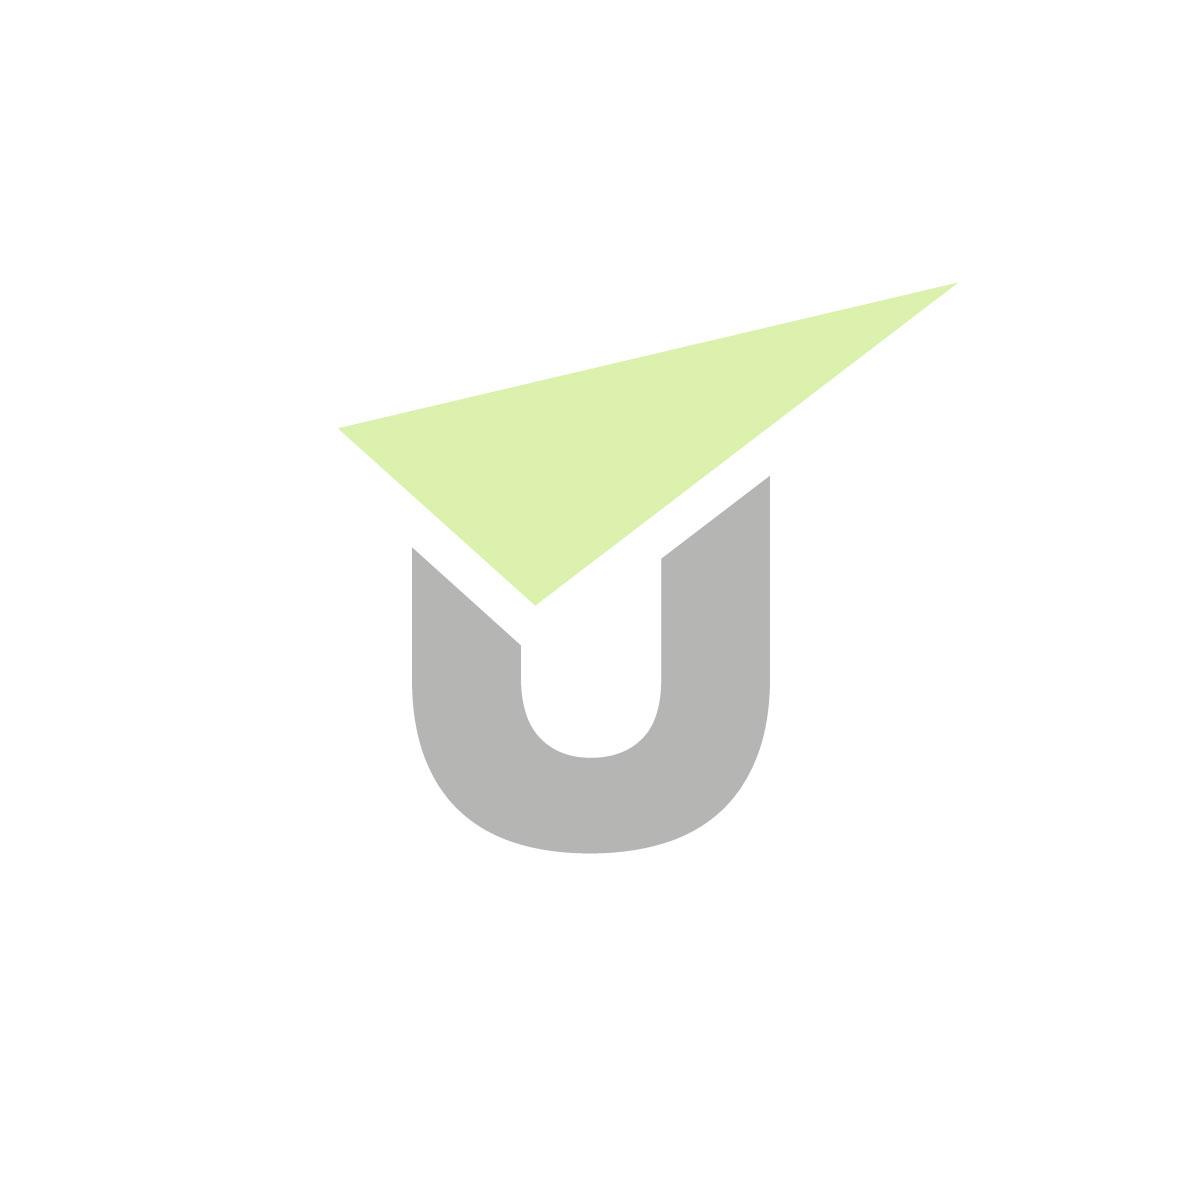 LALALOOM - Estantería SWEET SAFER amarillo de madera con 6 espacios como producto recomendado